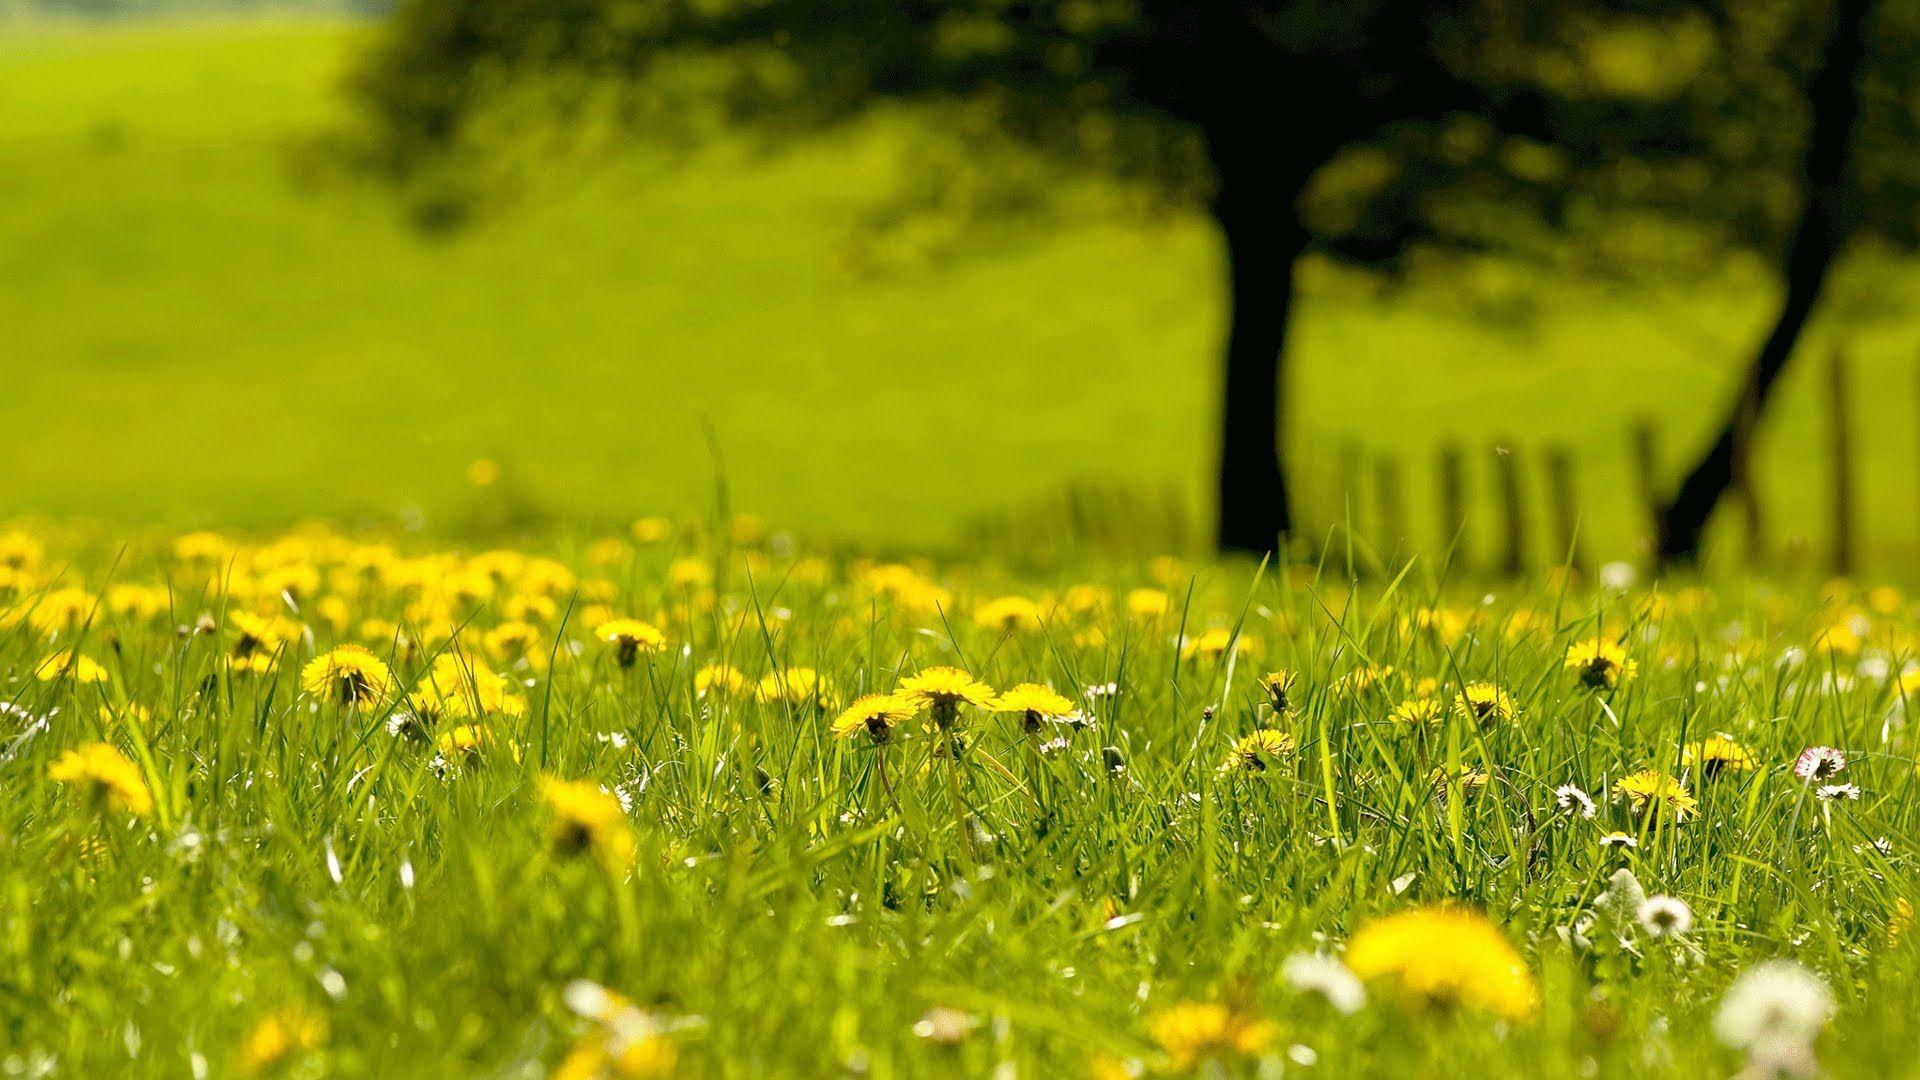 Light Background Guitar Music Study Think Yoga Meditation Field Wallpaper Nature Dandelion Wallpaper